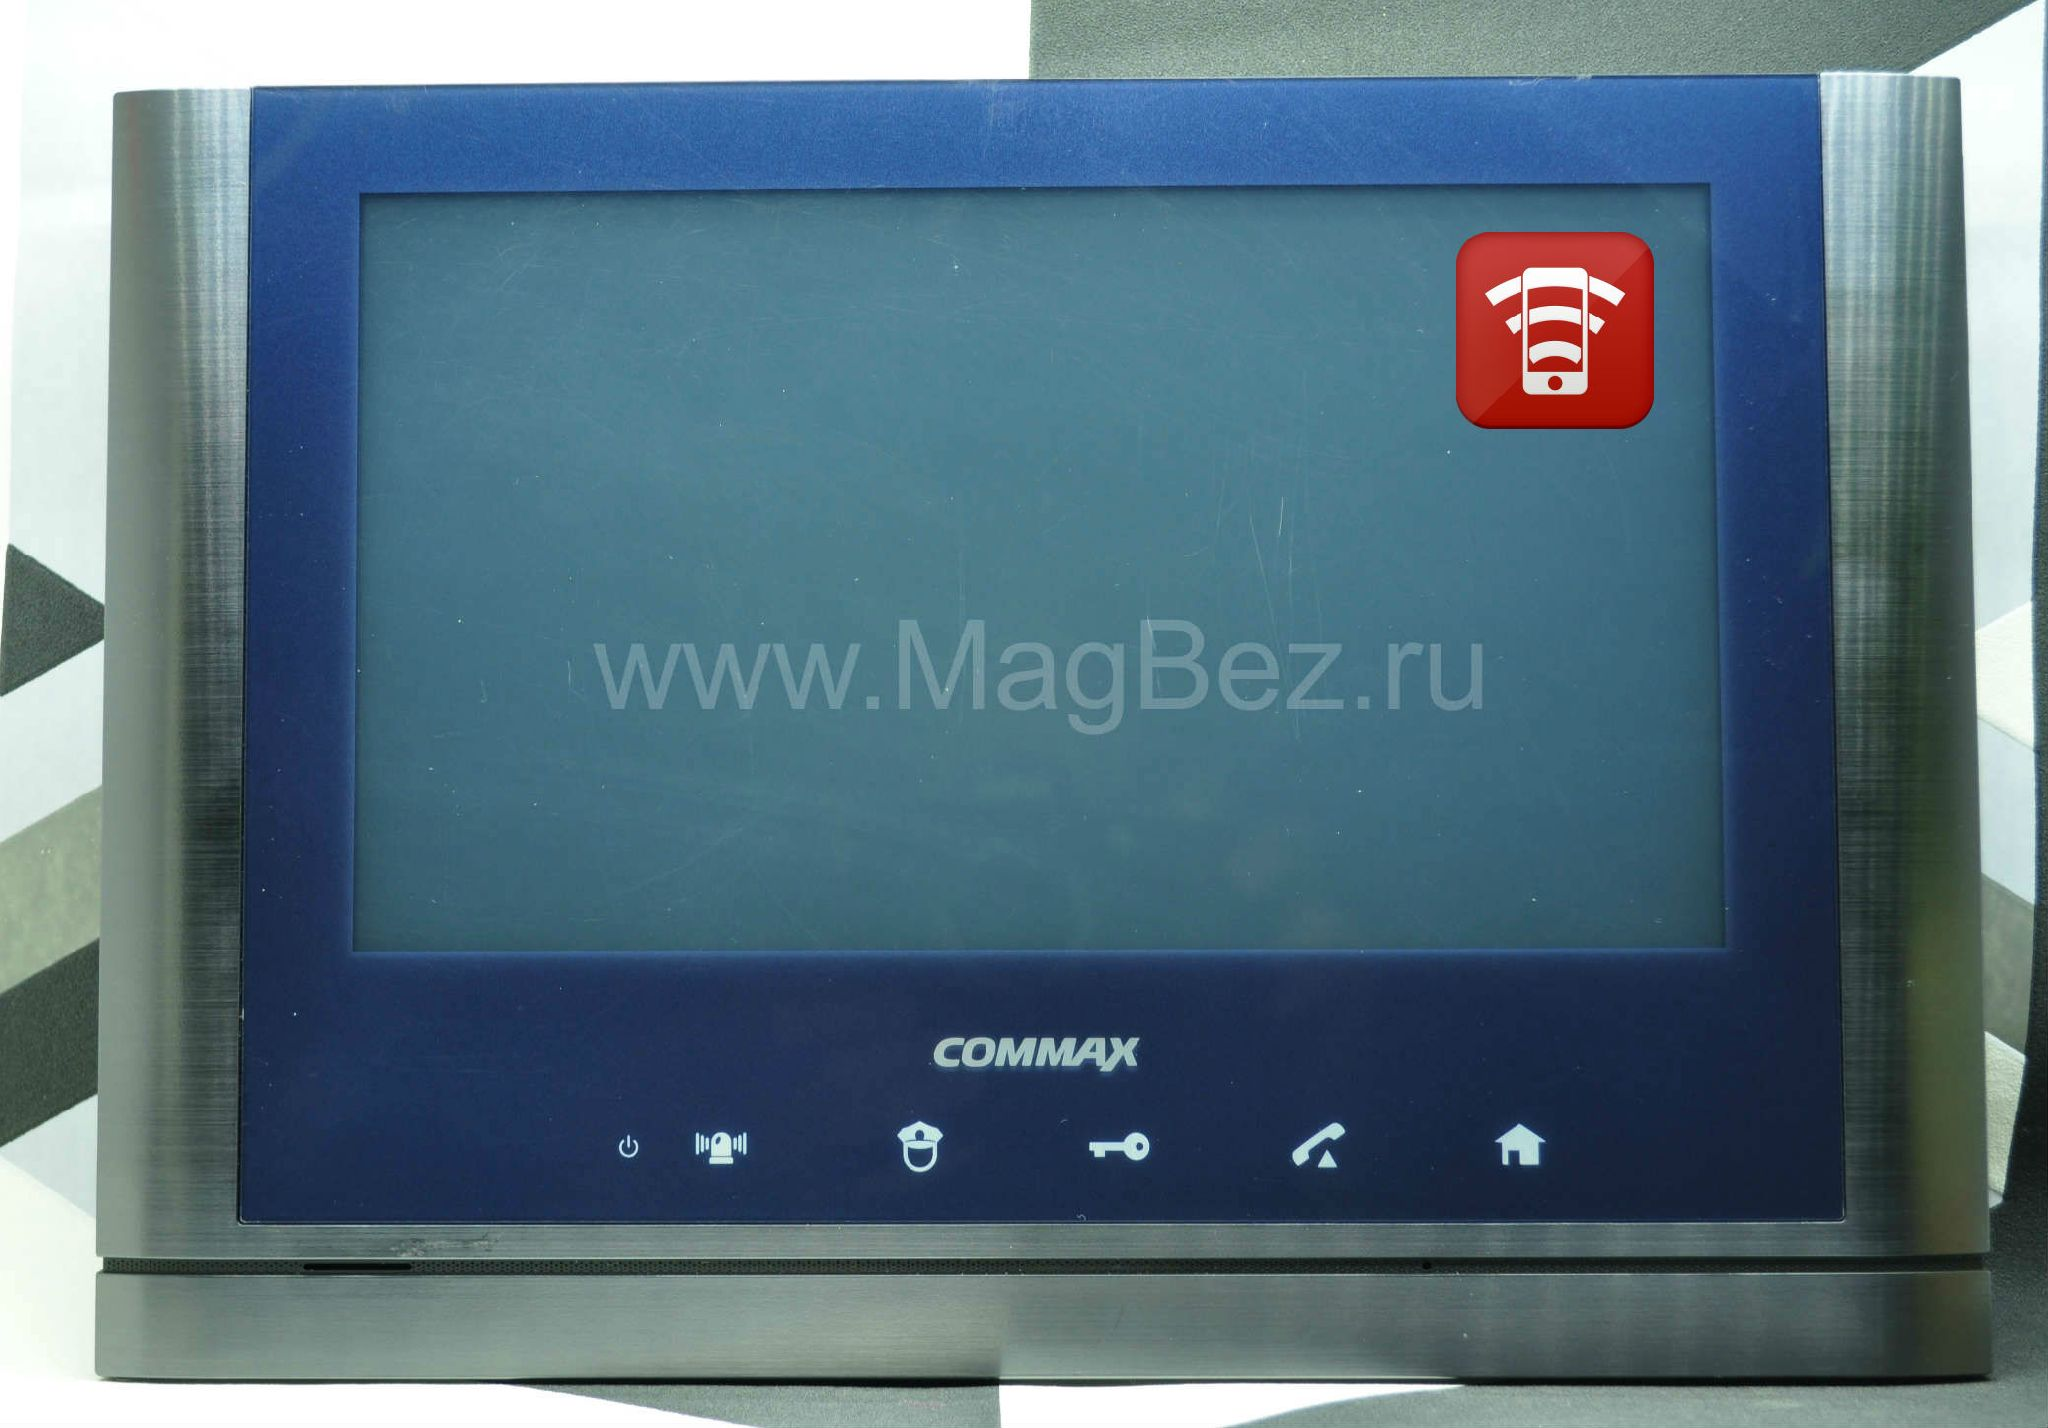 Commax CAV-1020MGX+